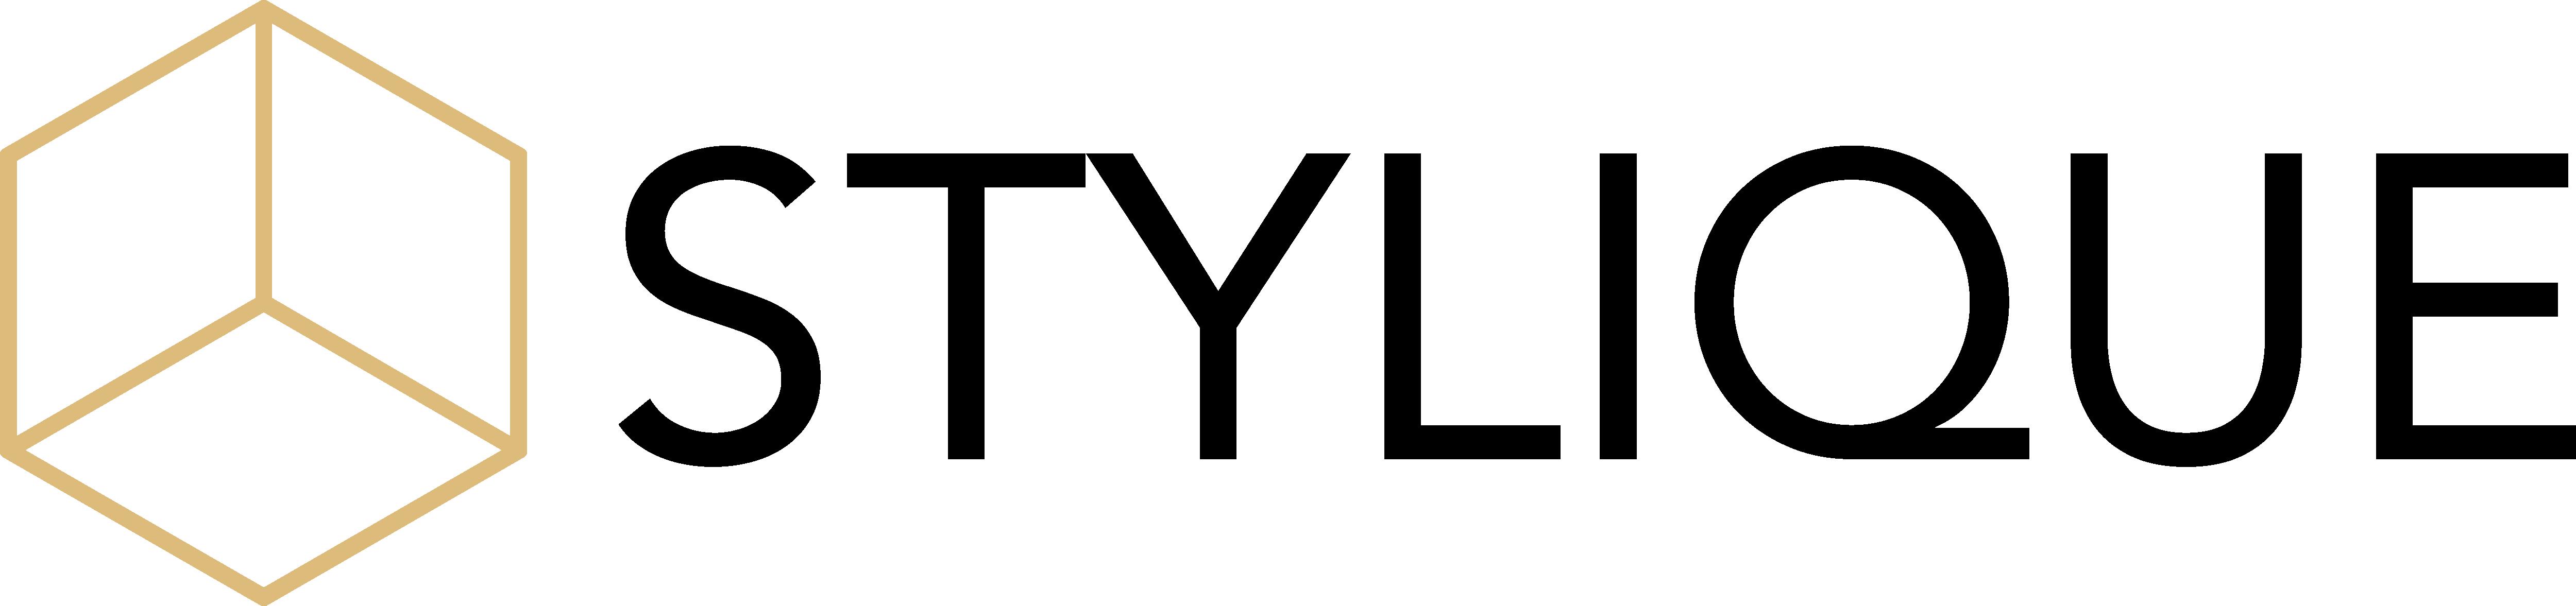 Logo 2020 - 1500x400pxeab5e149a38e343d898e0471729ada278232fdfb02d330b1dbc58a9c48c4c8b1